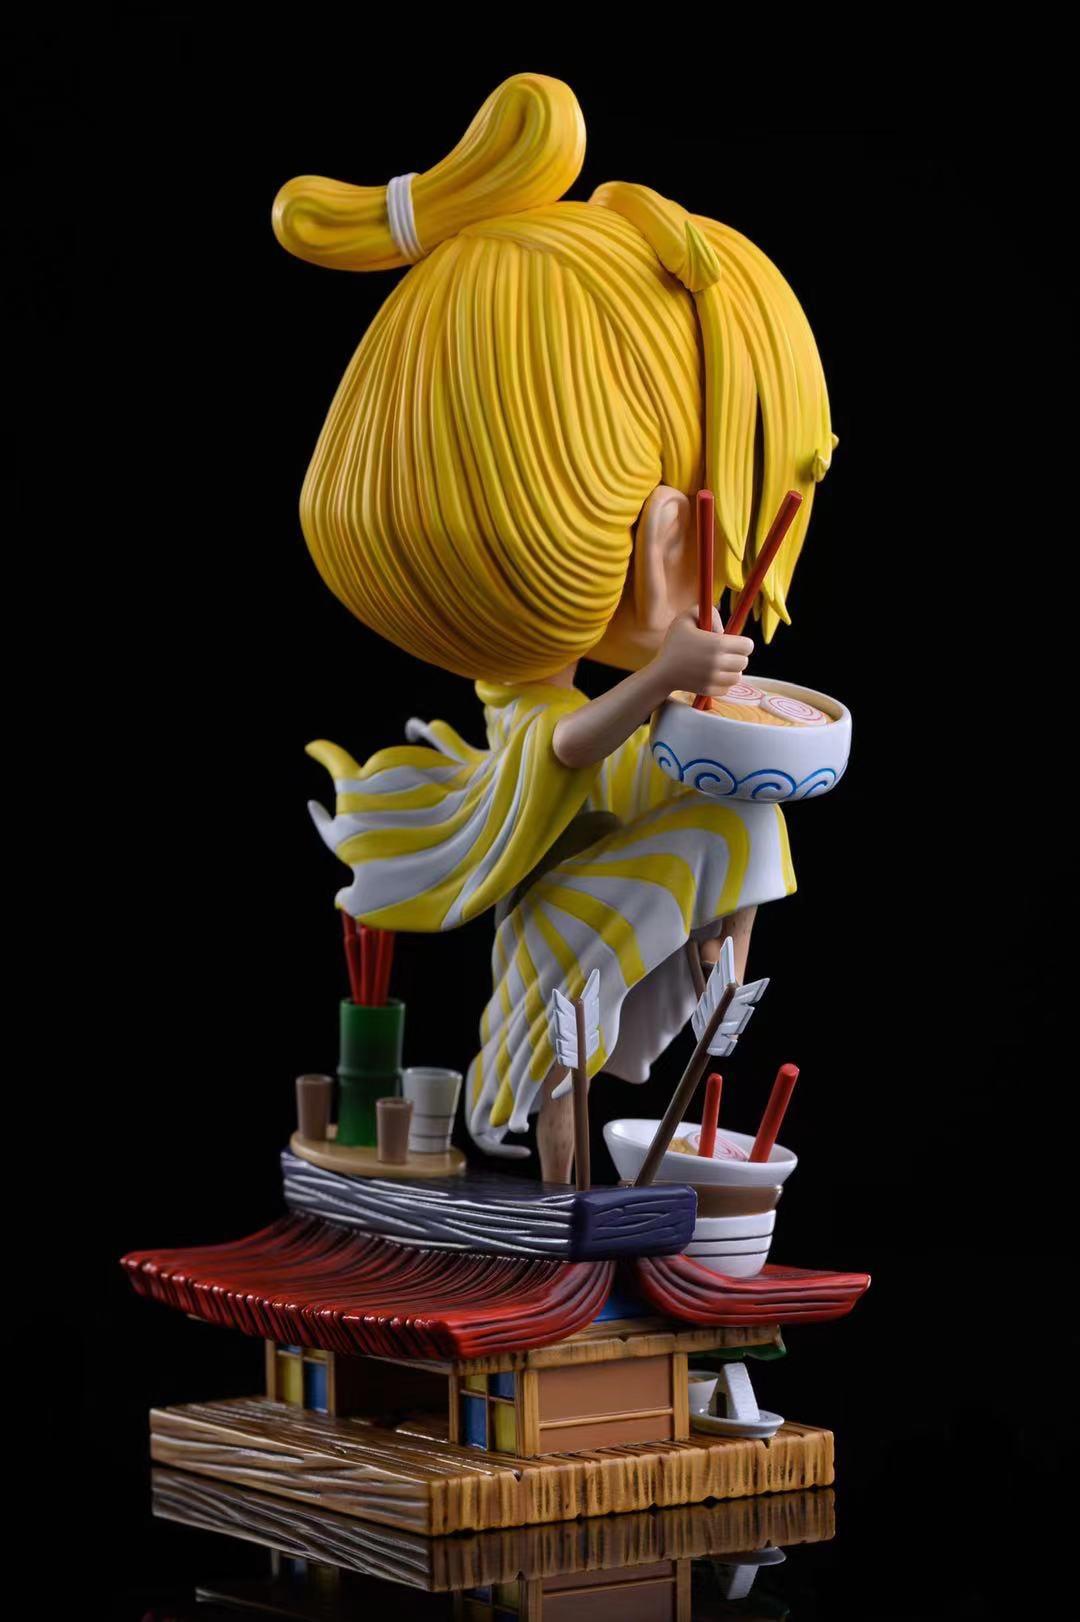 Vinsmoke Sanji ซันจิ วาโนะ by Joker Studio (มัดจำ)